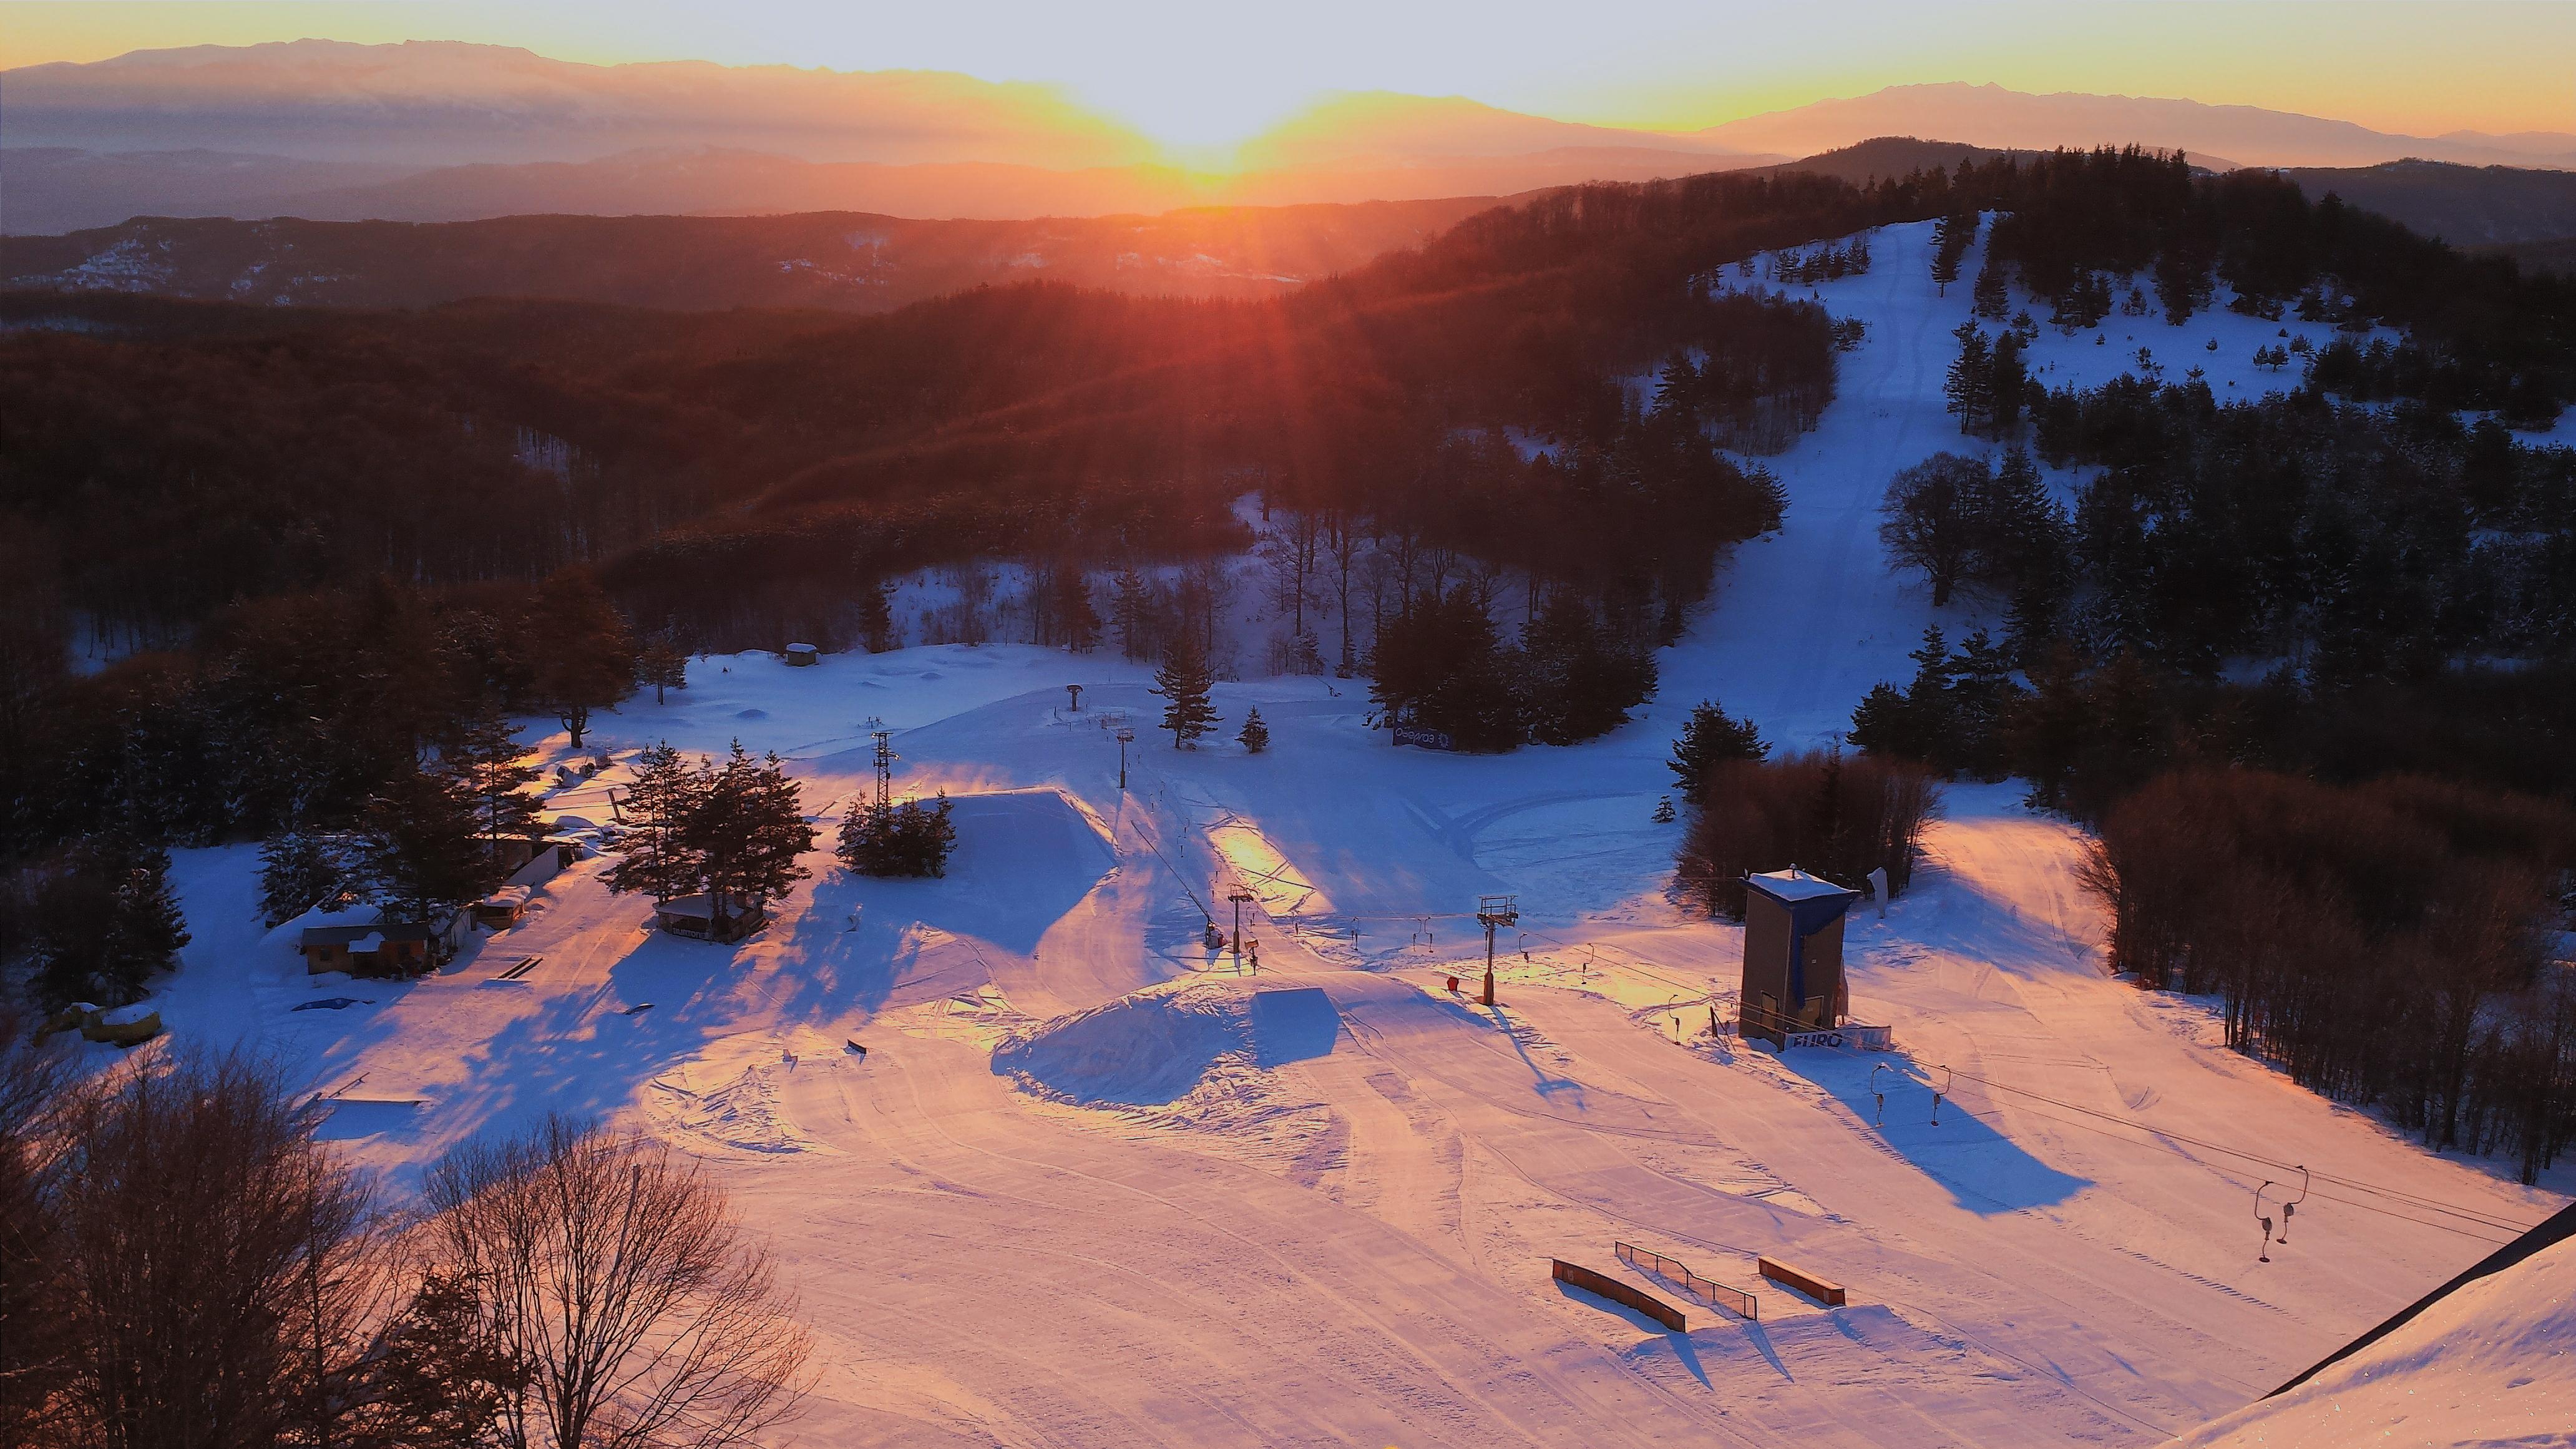 Osogovo Snow Park